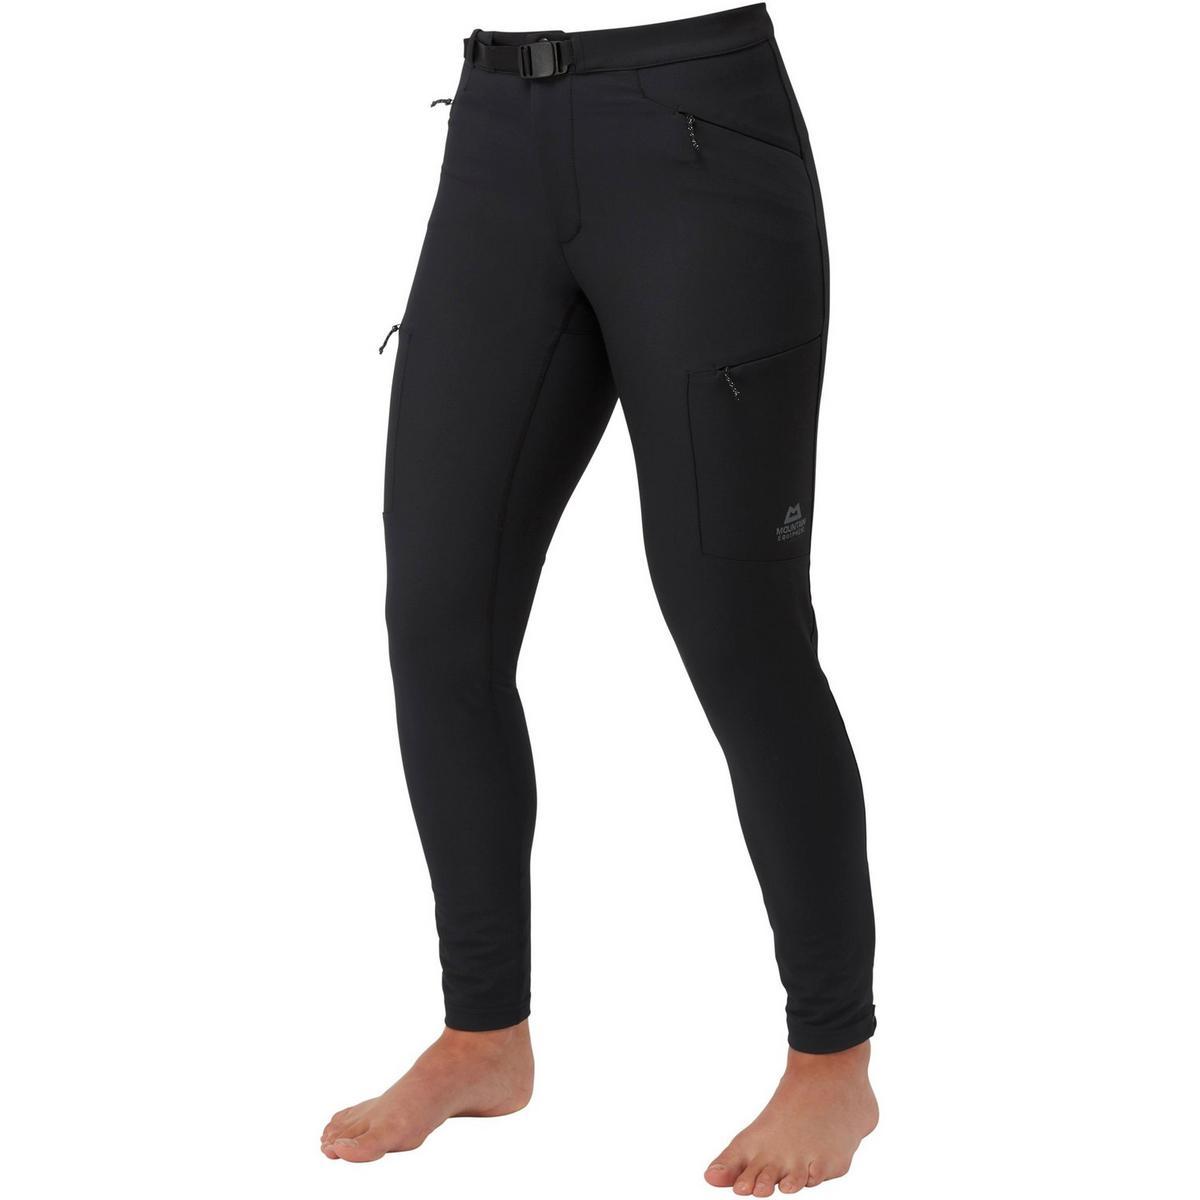 Mountain Equipment Women's Austra Tight - Black